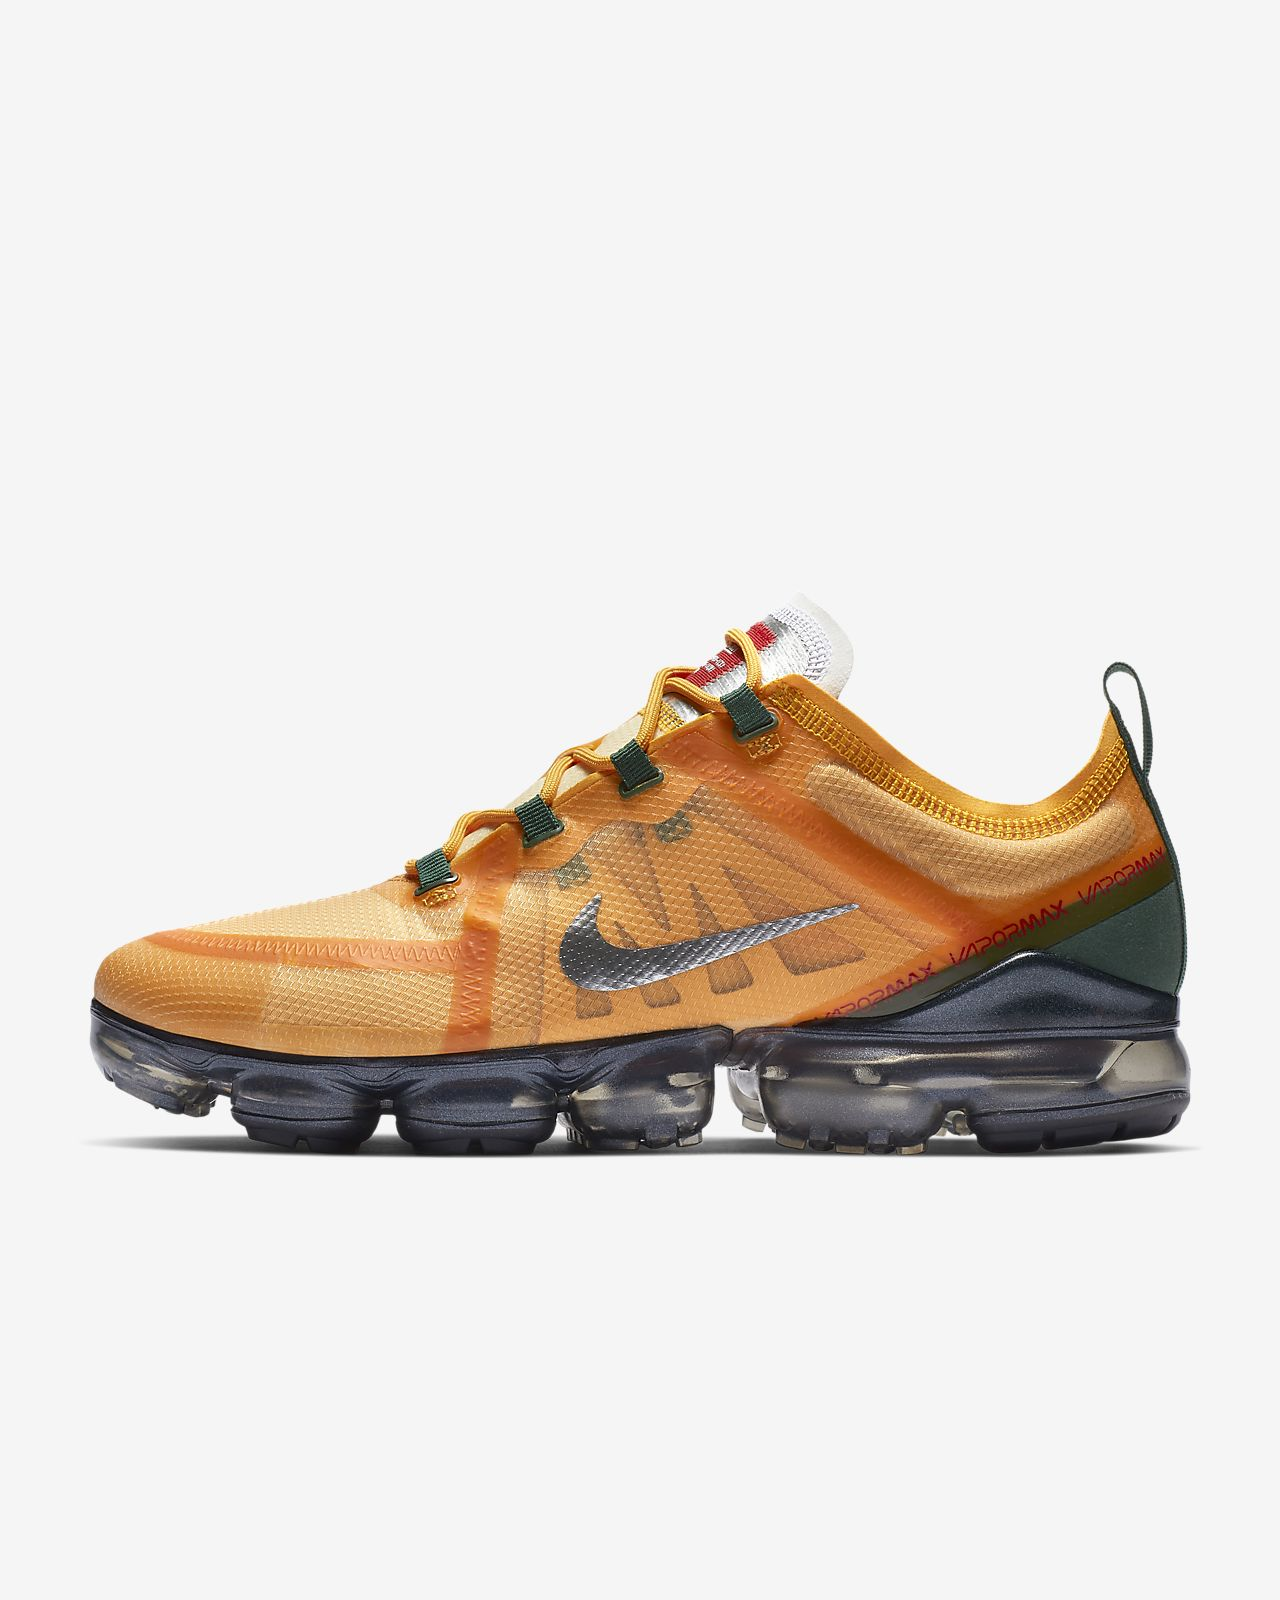 promo code 7b5f6 8ffbd Nike Air VaporMax 2019 Shoe. Nike.com